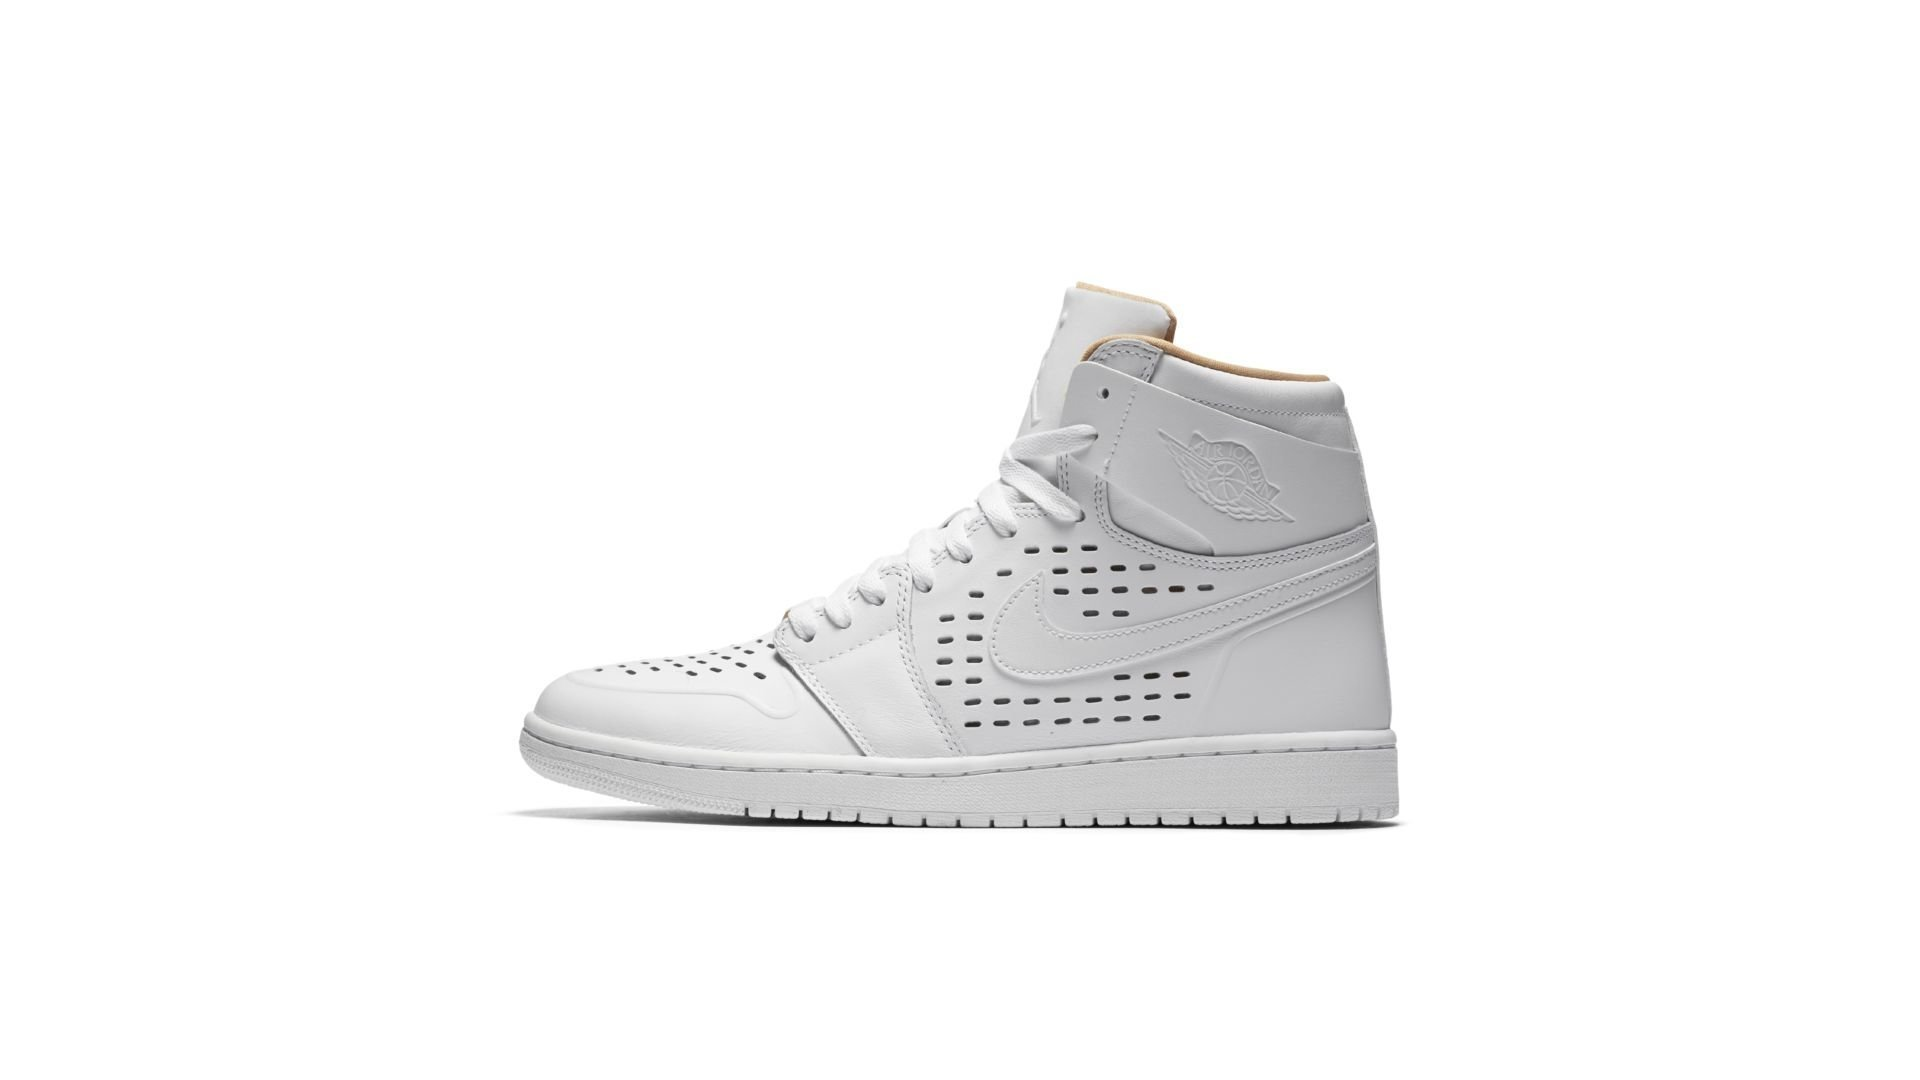 Jordan 1 Retro White Vachetta Tan (845018-142)